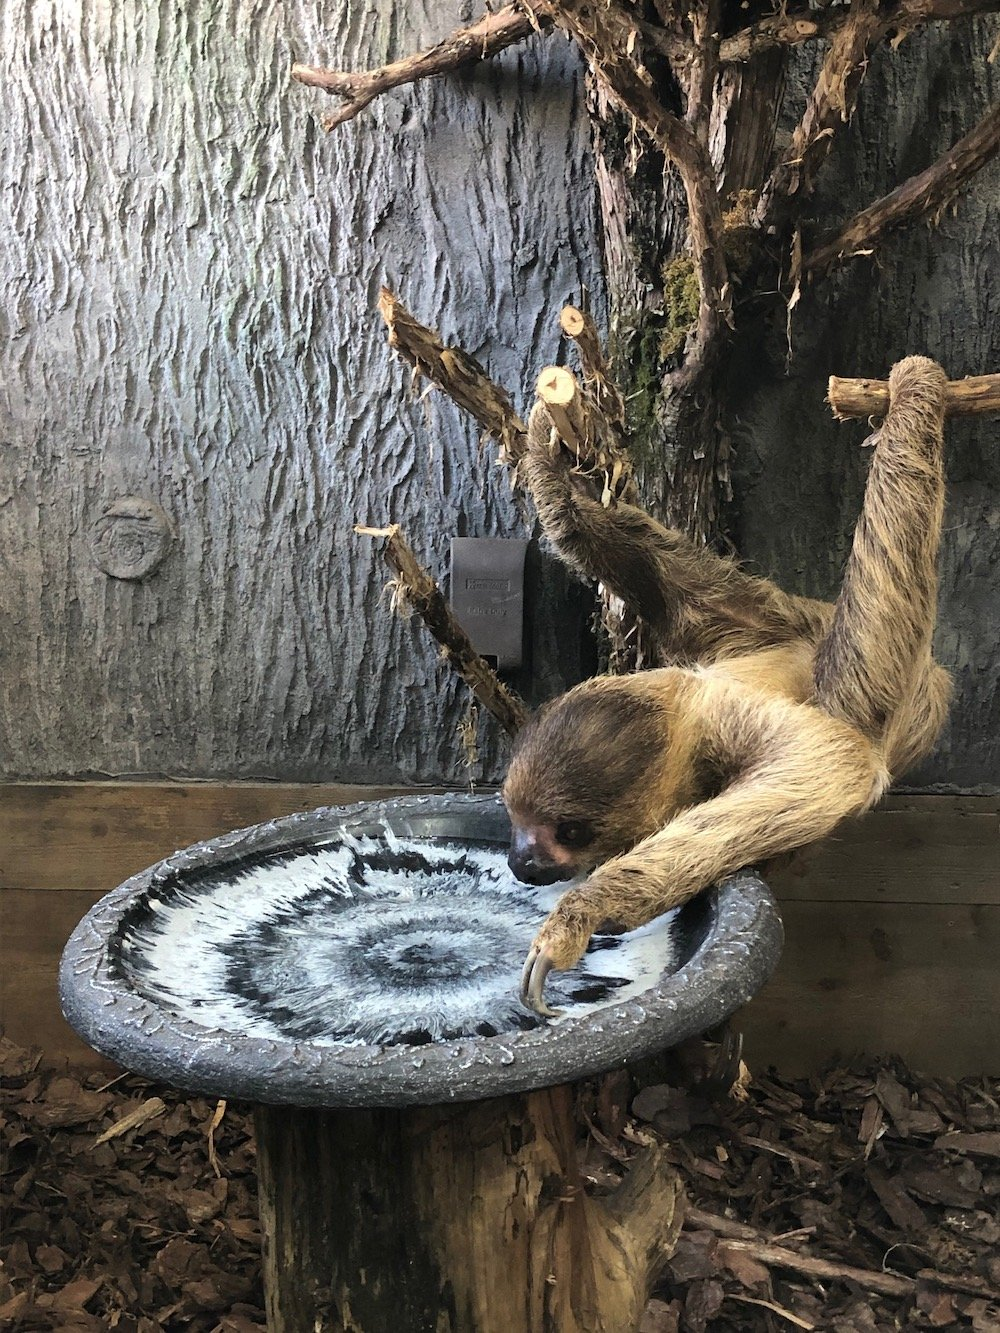 Sloth Drinking